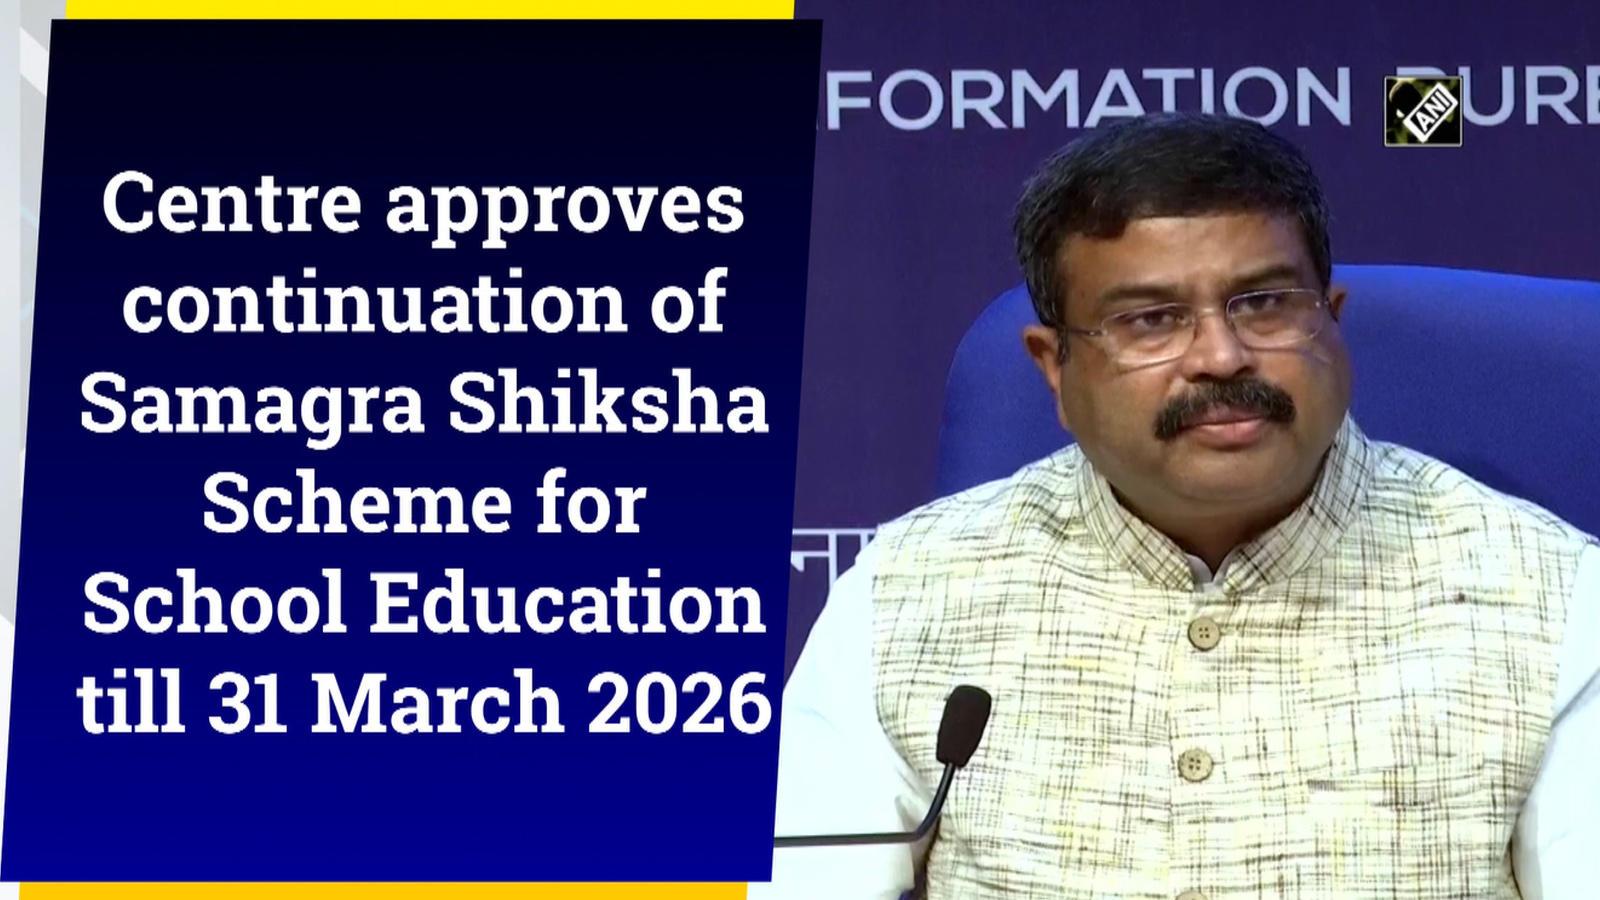 centre-approves-continuation-of-samagra-shiksha-scheme-for-school-education-till-31-march-2026